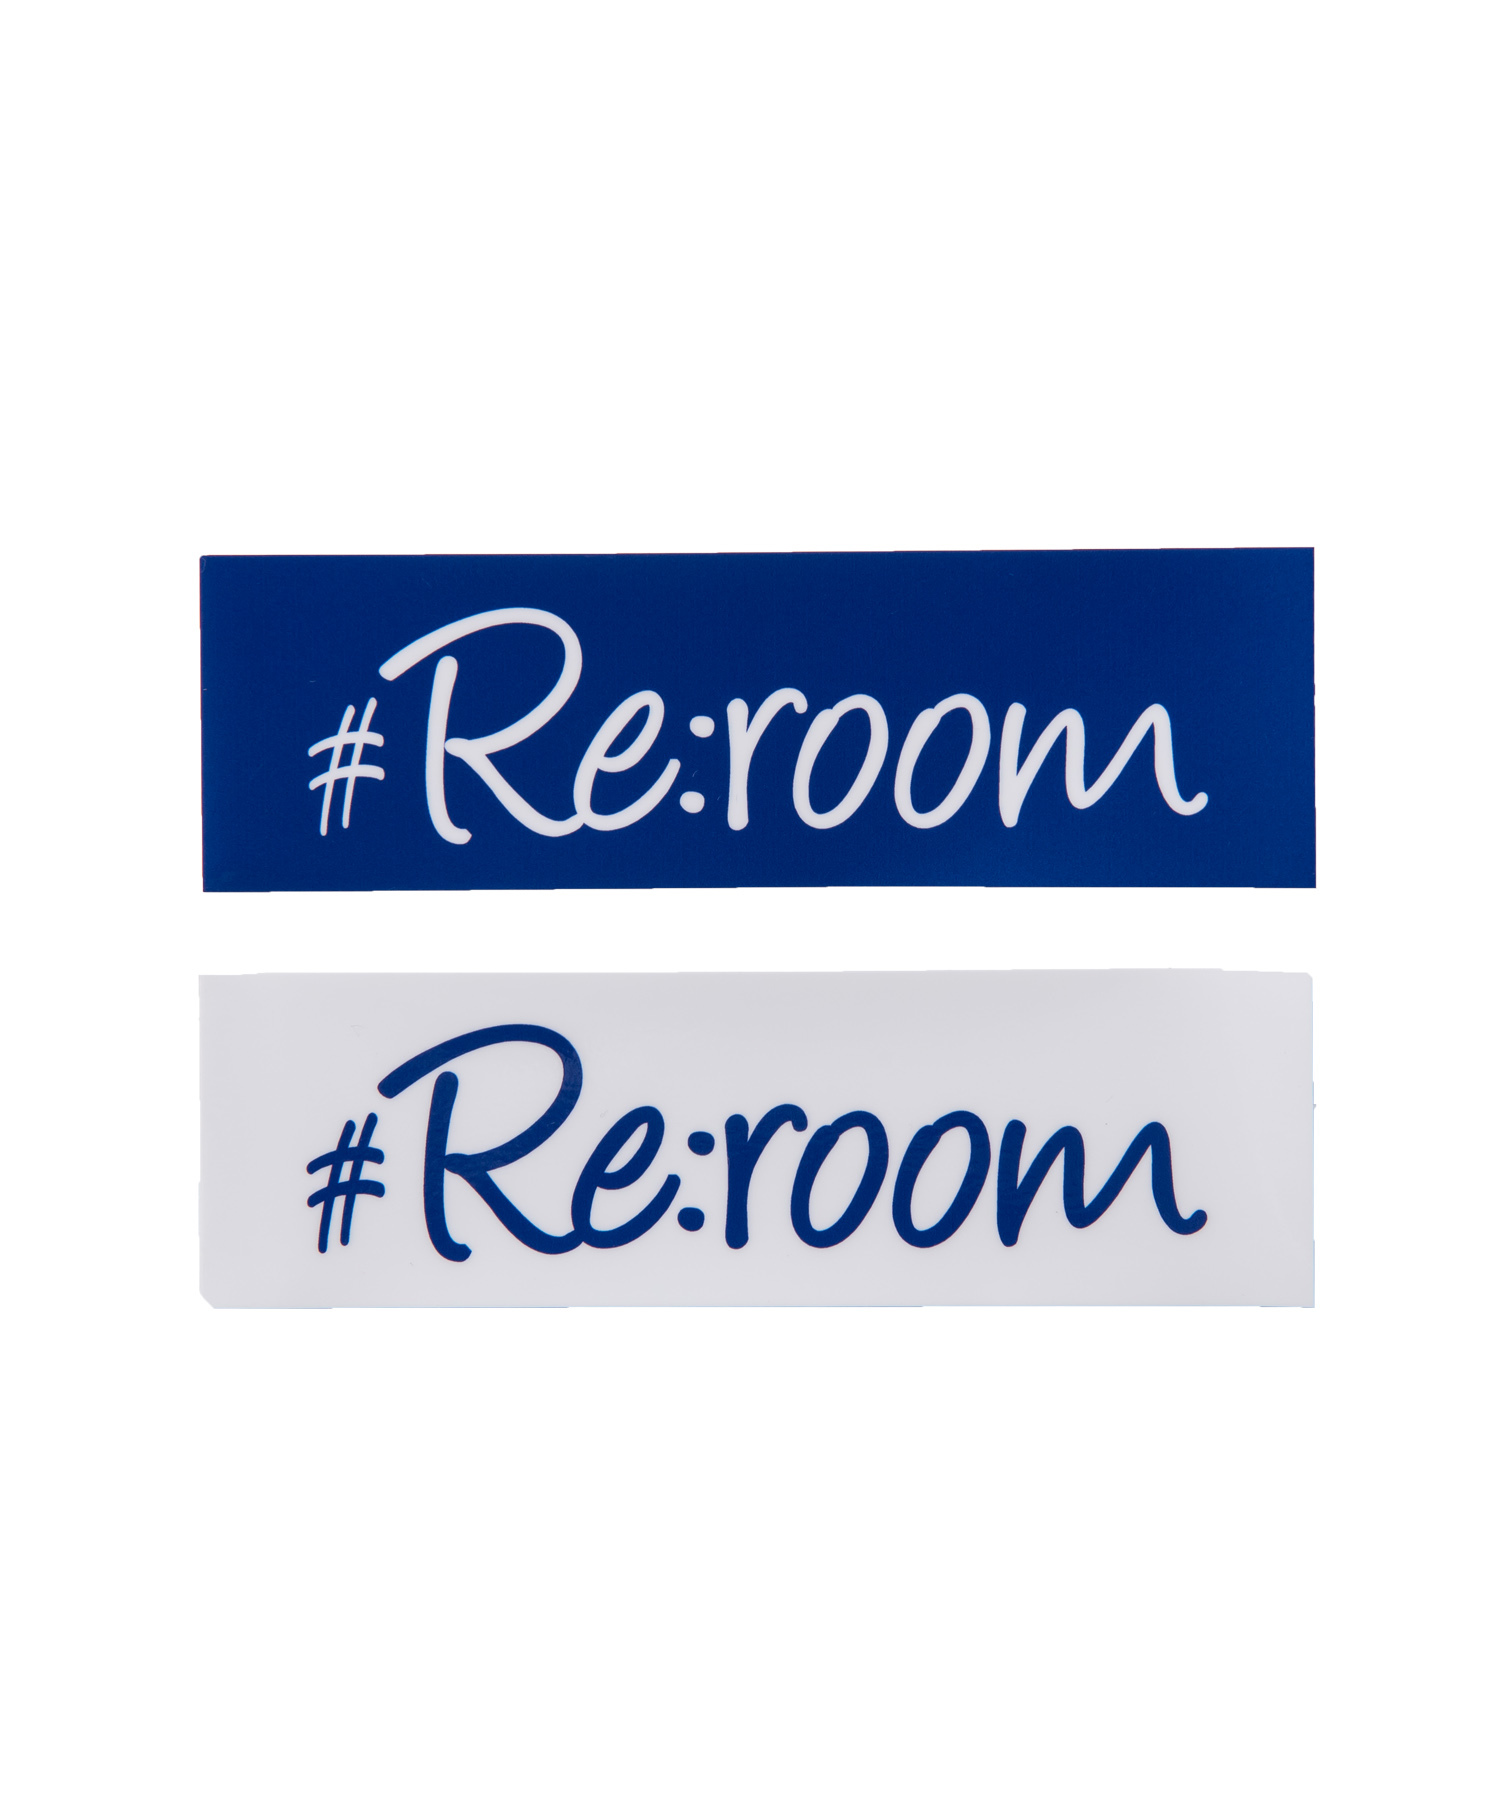 #Re:room LOGO STICKER[REG019]